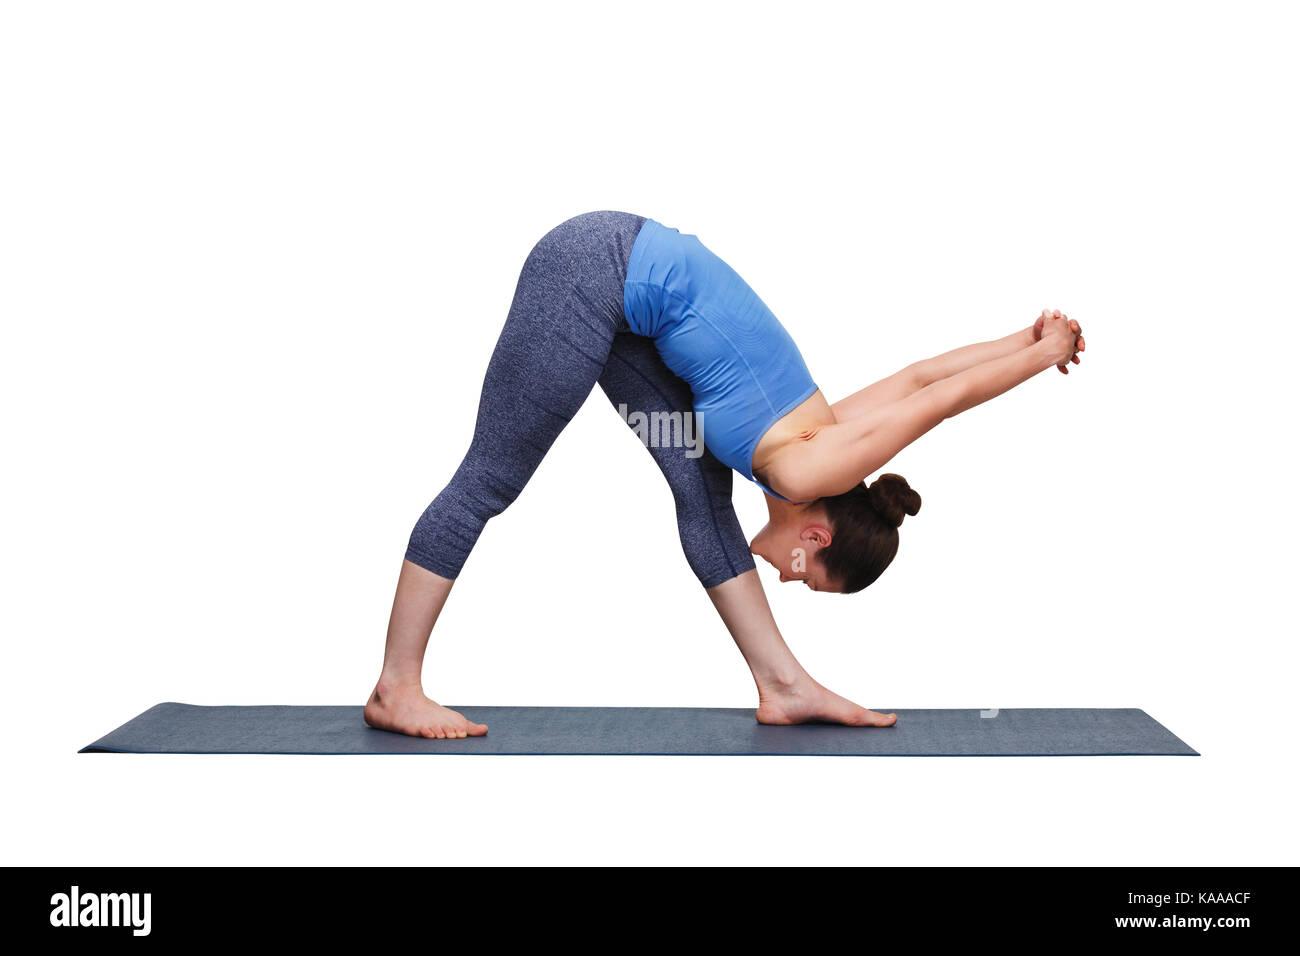 woman doing ashtanga vinyasa yoga asana parsvottanasana stock image - Ausatmen Fans Usa